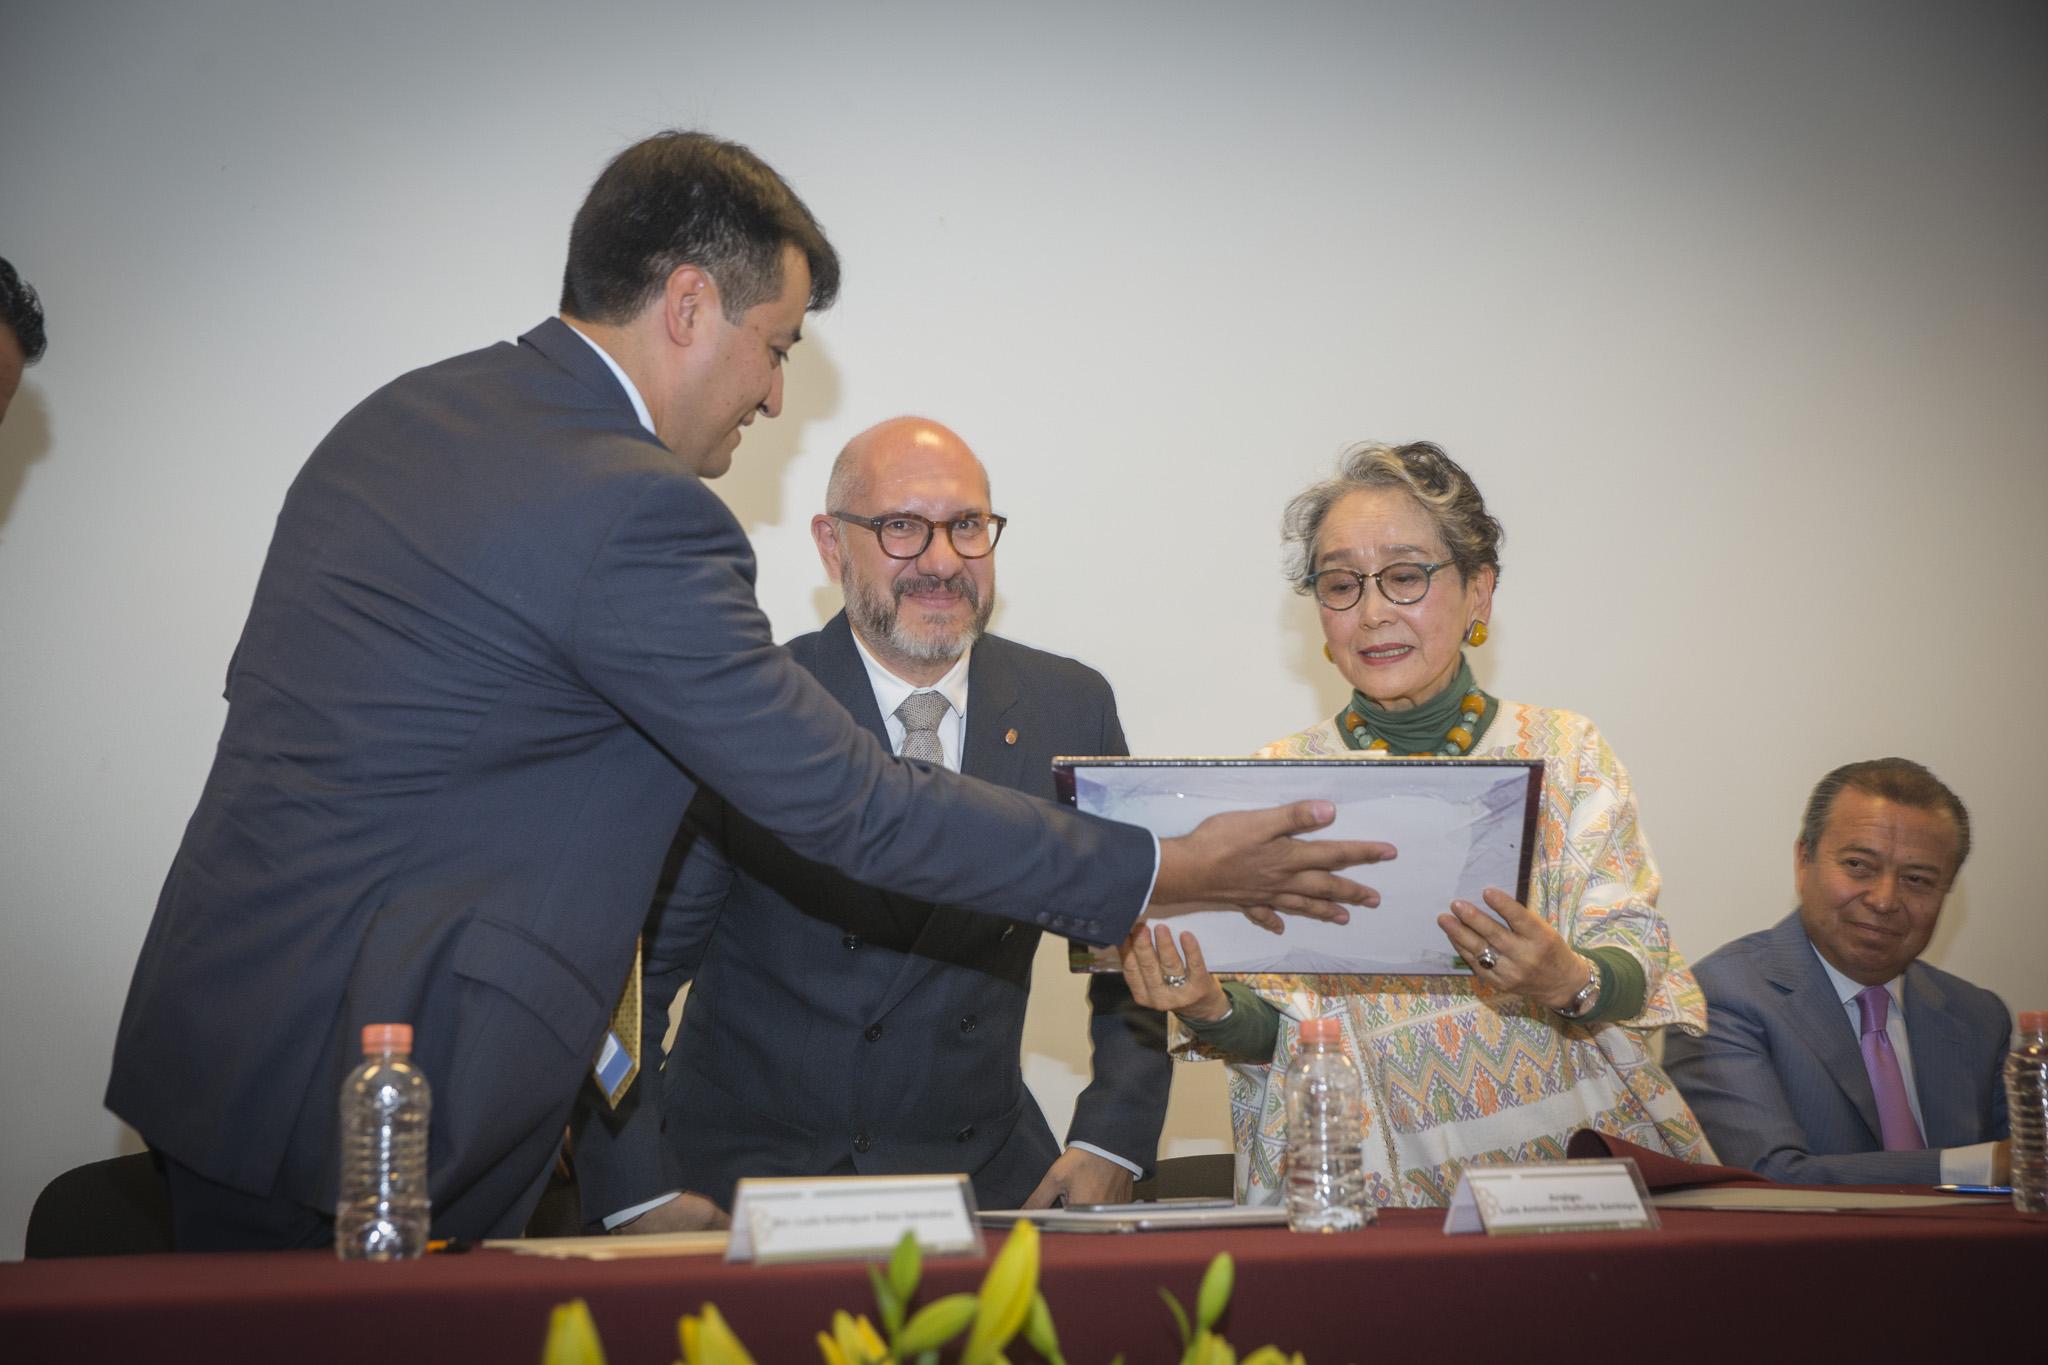 Rinden homenaje a investigadora Yoko Sugiura Yamamoto